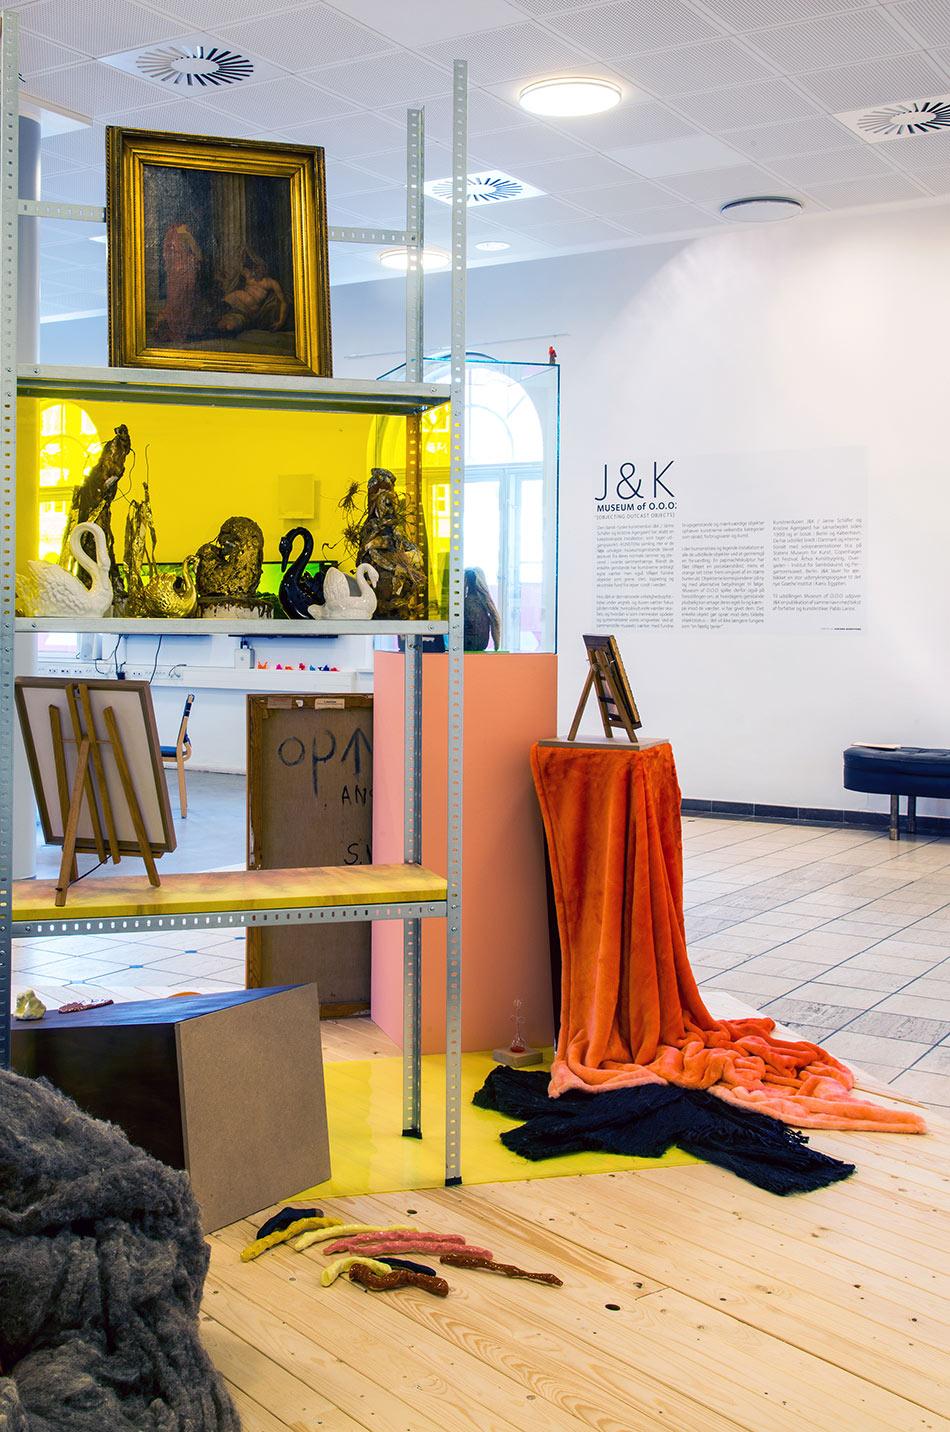 J&K, Museum of O.O.O., installation detail, Kunsten Aalborg, 2015, photo: Fabæk